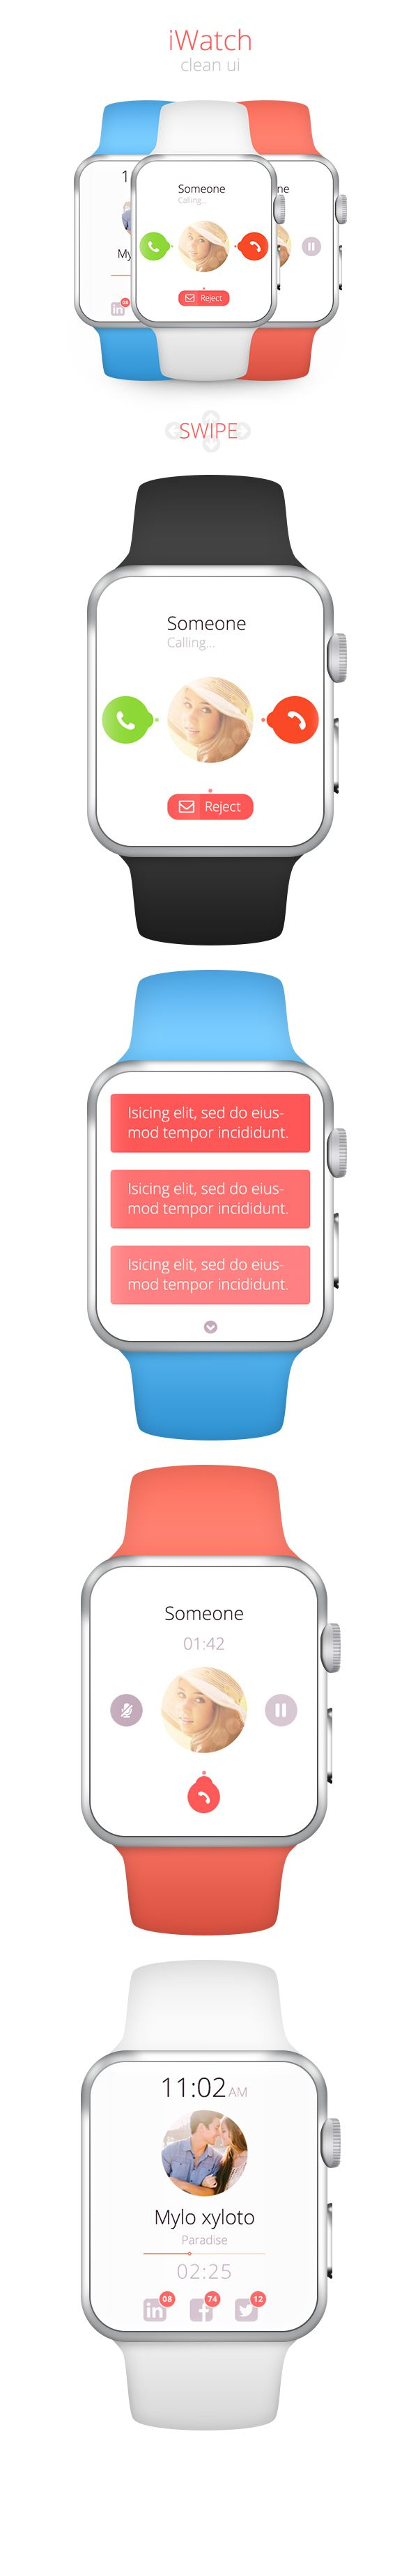 iwatch ui on Behance